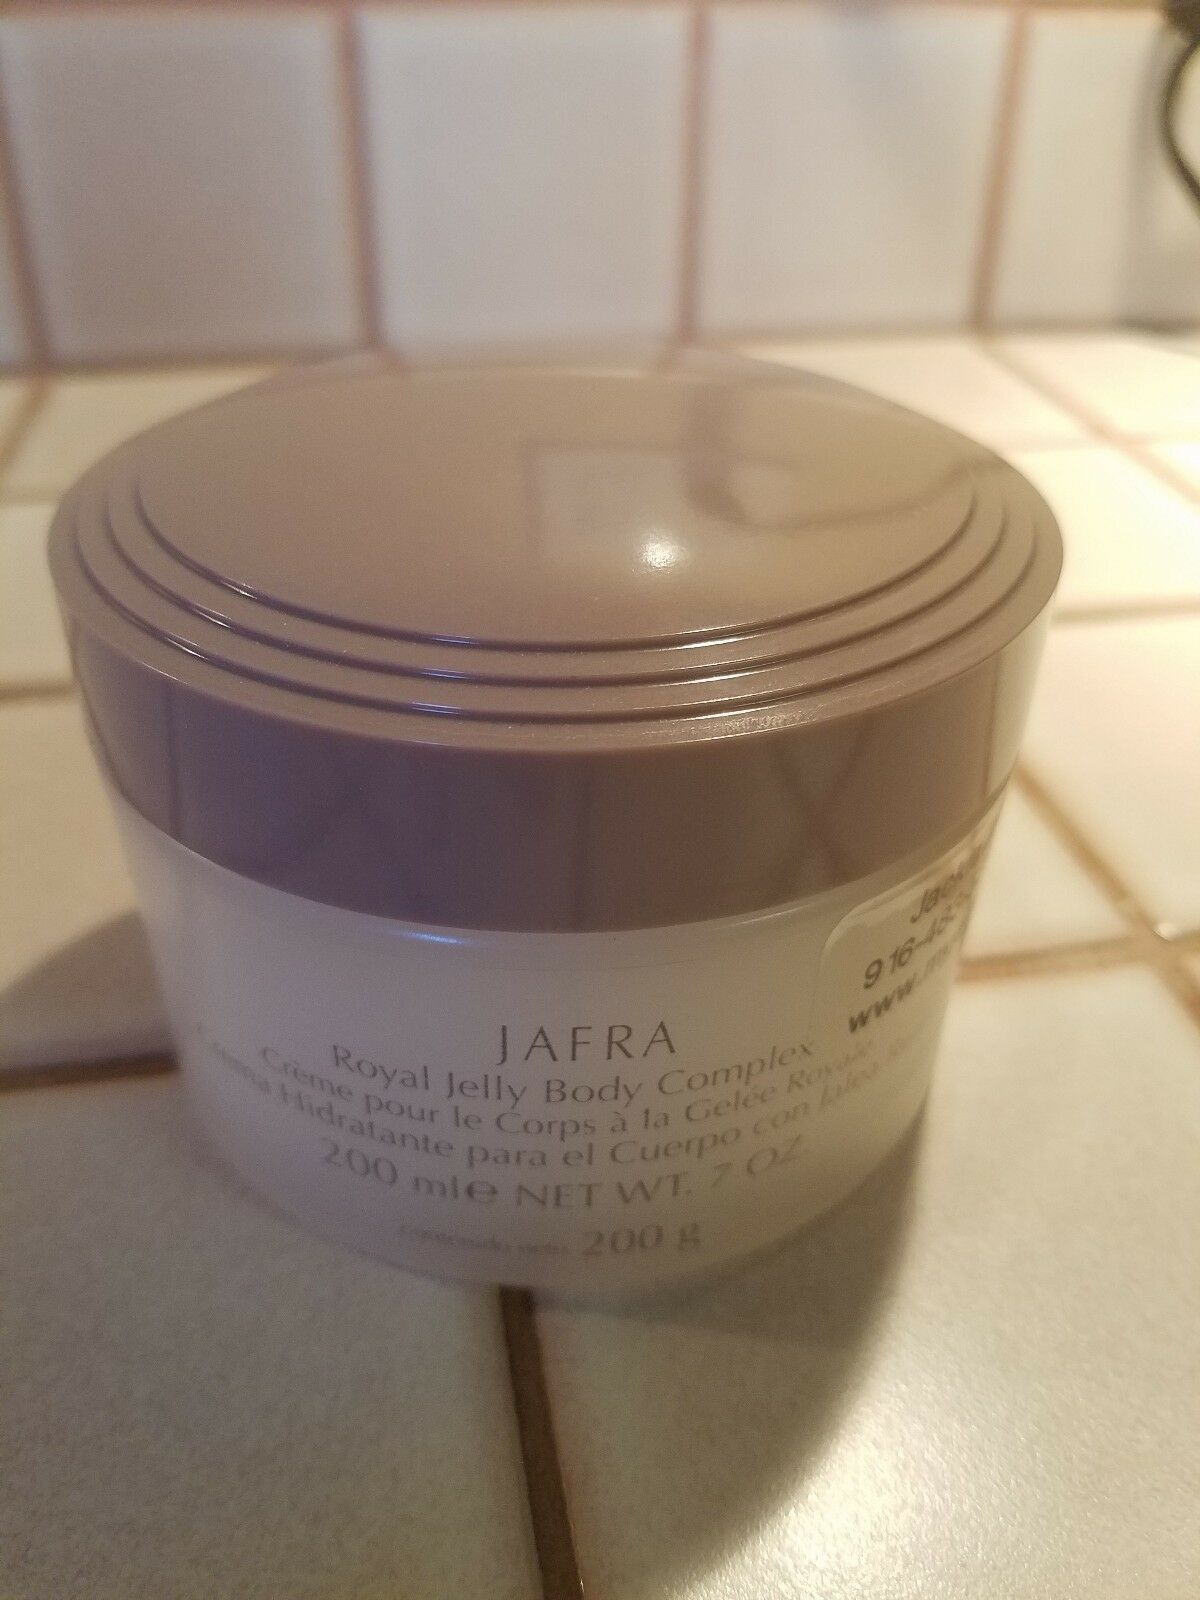 Jafra Royal Jelly Body Complex Ebay Stock Photo